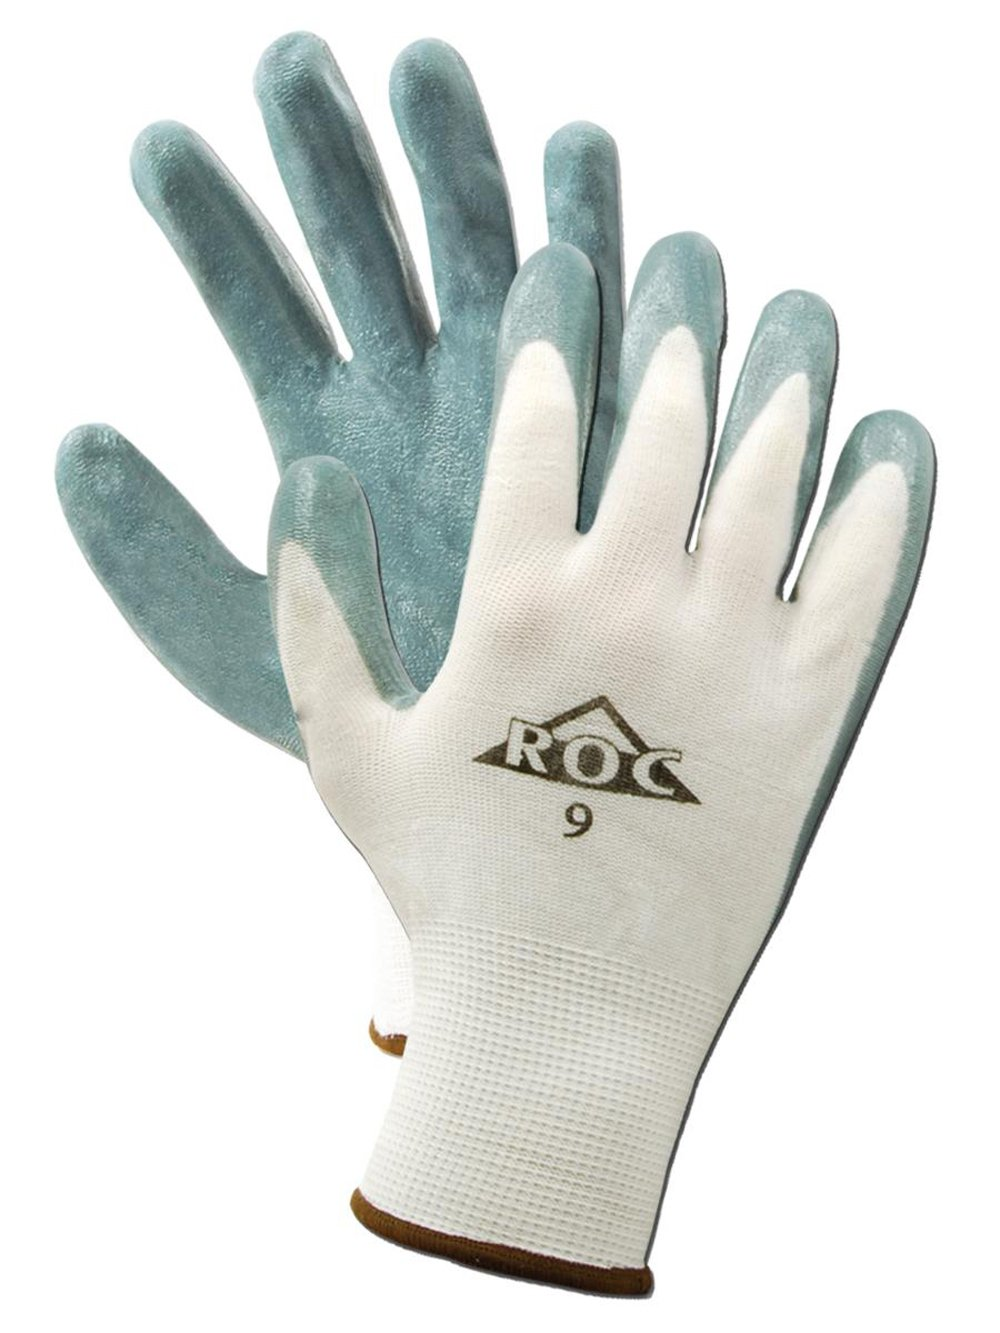 "MAGID ROC GP560 Nylon Glove, Gray Foam Nitrile Palm Coating, Knit Wrist Cuff, 10"" Length, Size 10  (12 Pair)"